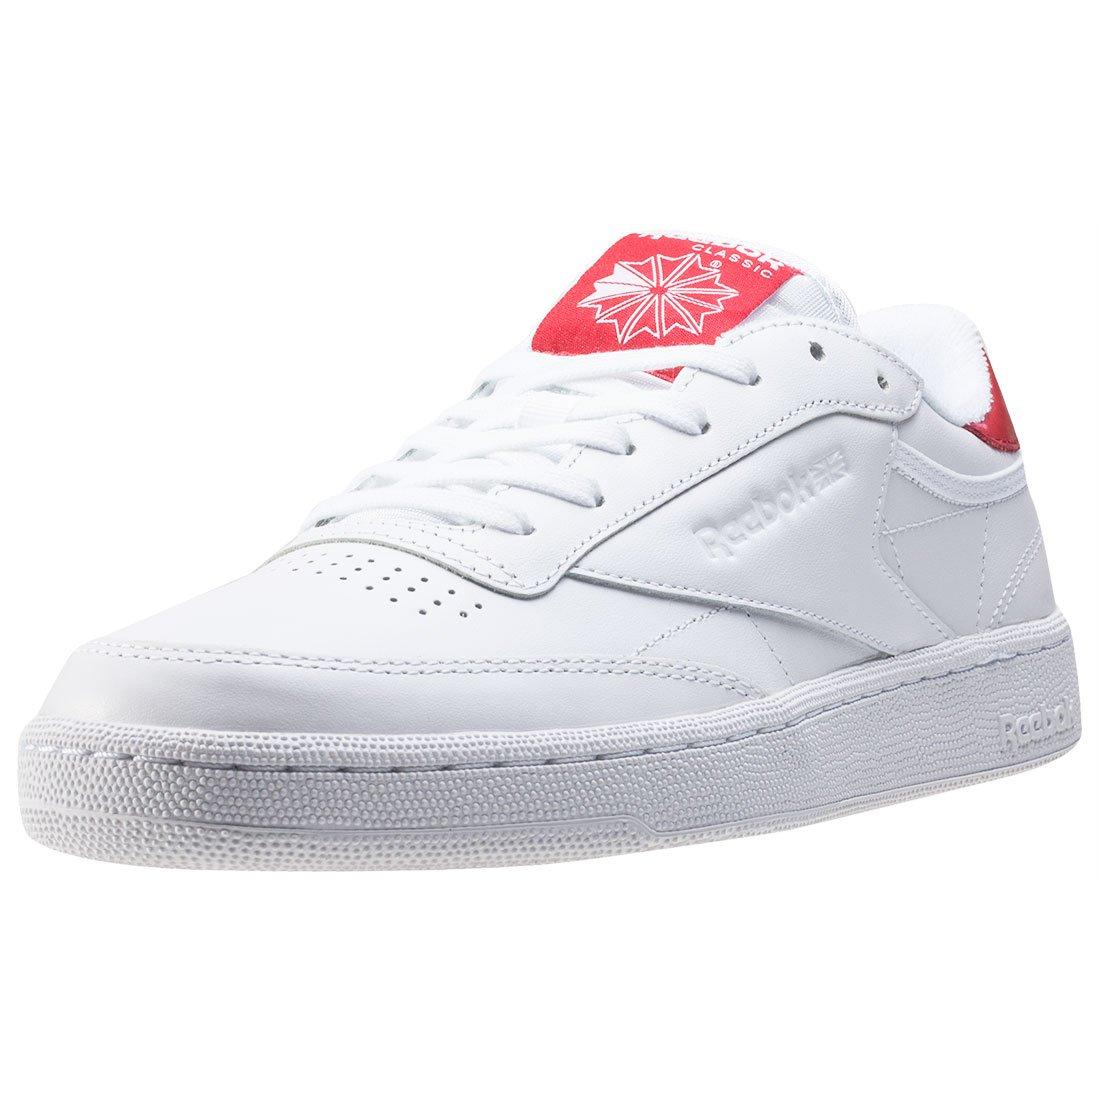 Reebok Herren Schuhe / Sneaker Club C 85 EL  9 UK|White Red